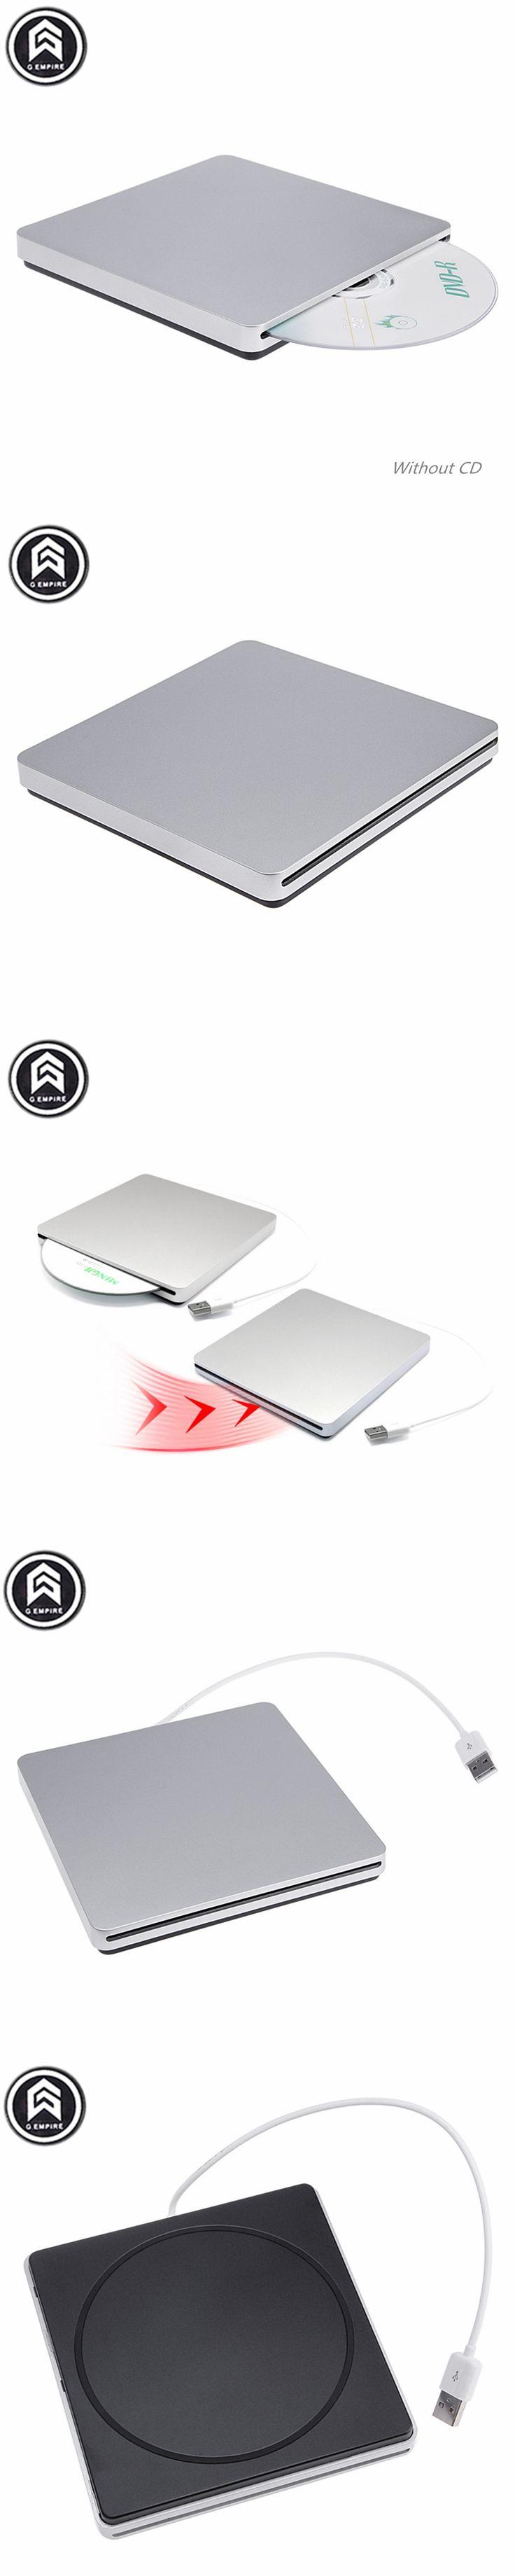 New Portable External Slim  sucker type  USB  DVD-RW/CD-RW Burner Recorder  Optical Drive  Plug and Play For  Apple Macbook Lapt